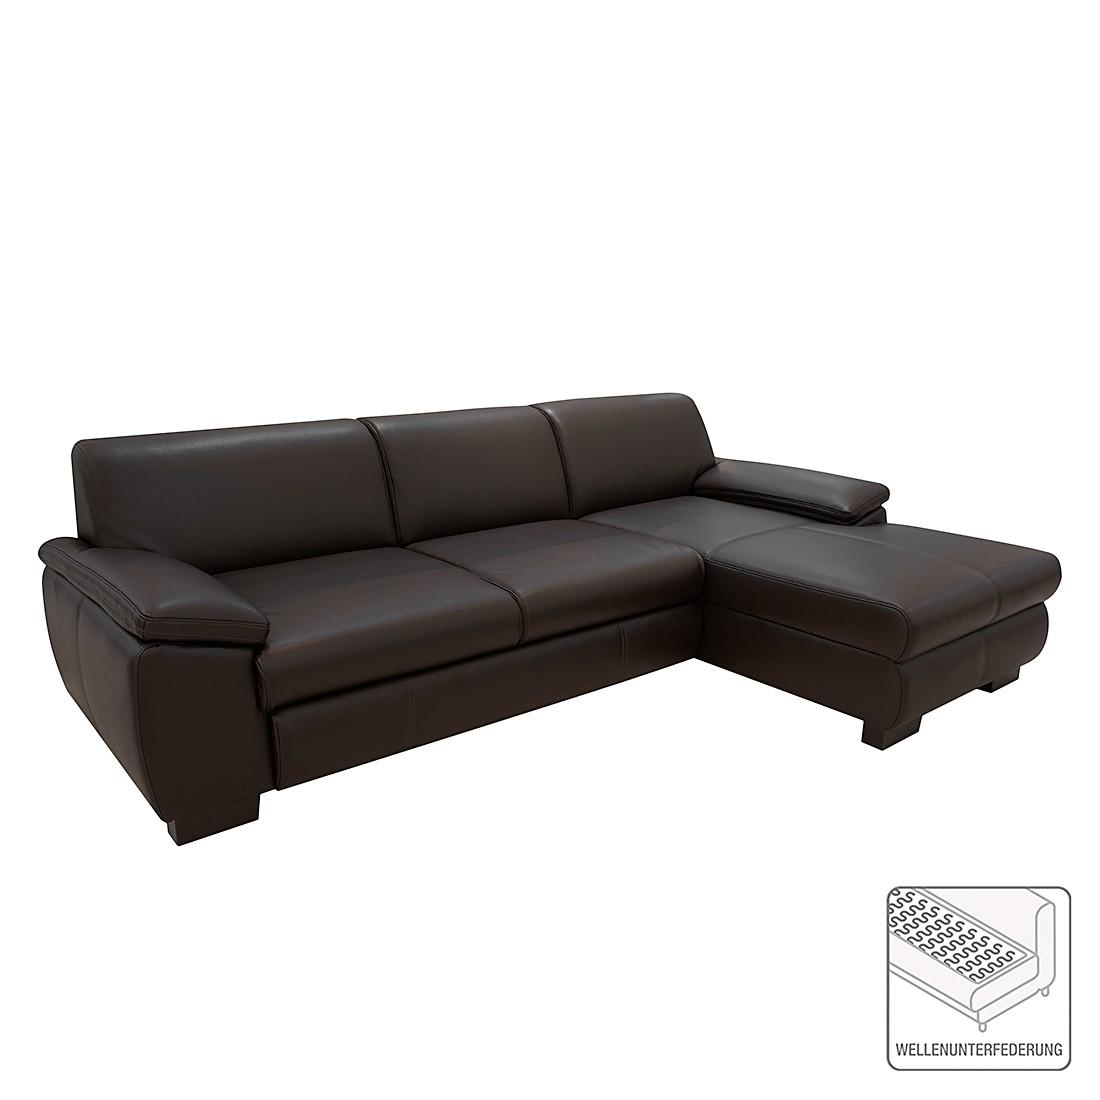 ecksofa shannon mit schlaffunktion kunstleder braun longchair davorstehend rechts. Black Bedroom Furniture Sets. Home Design Ideas